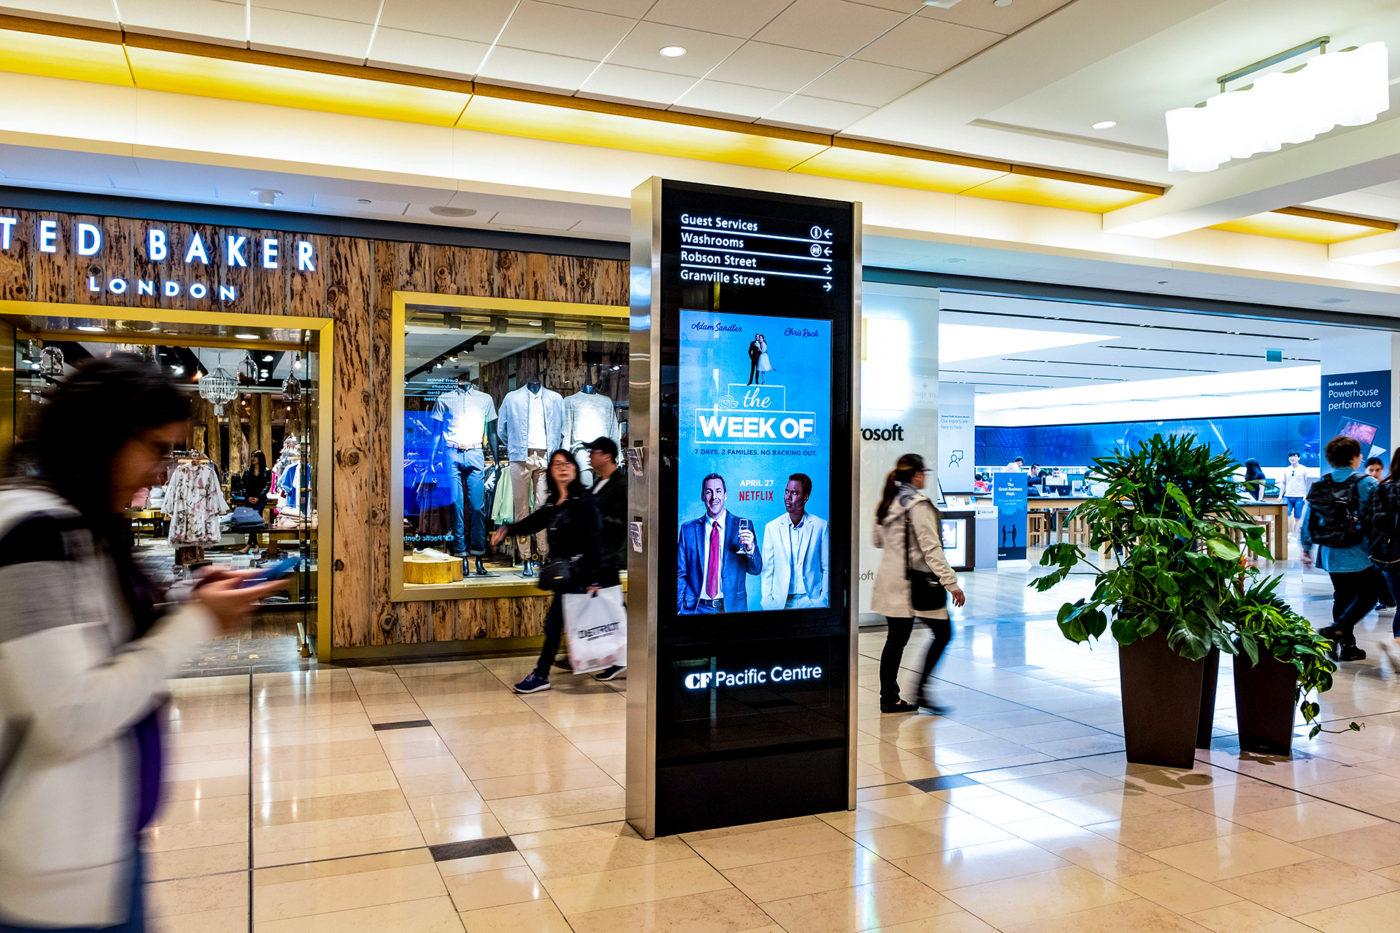 Netflix – The Week Of - Malls - CF Pacific Mall - Digital Directory (Markham, Ontario)